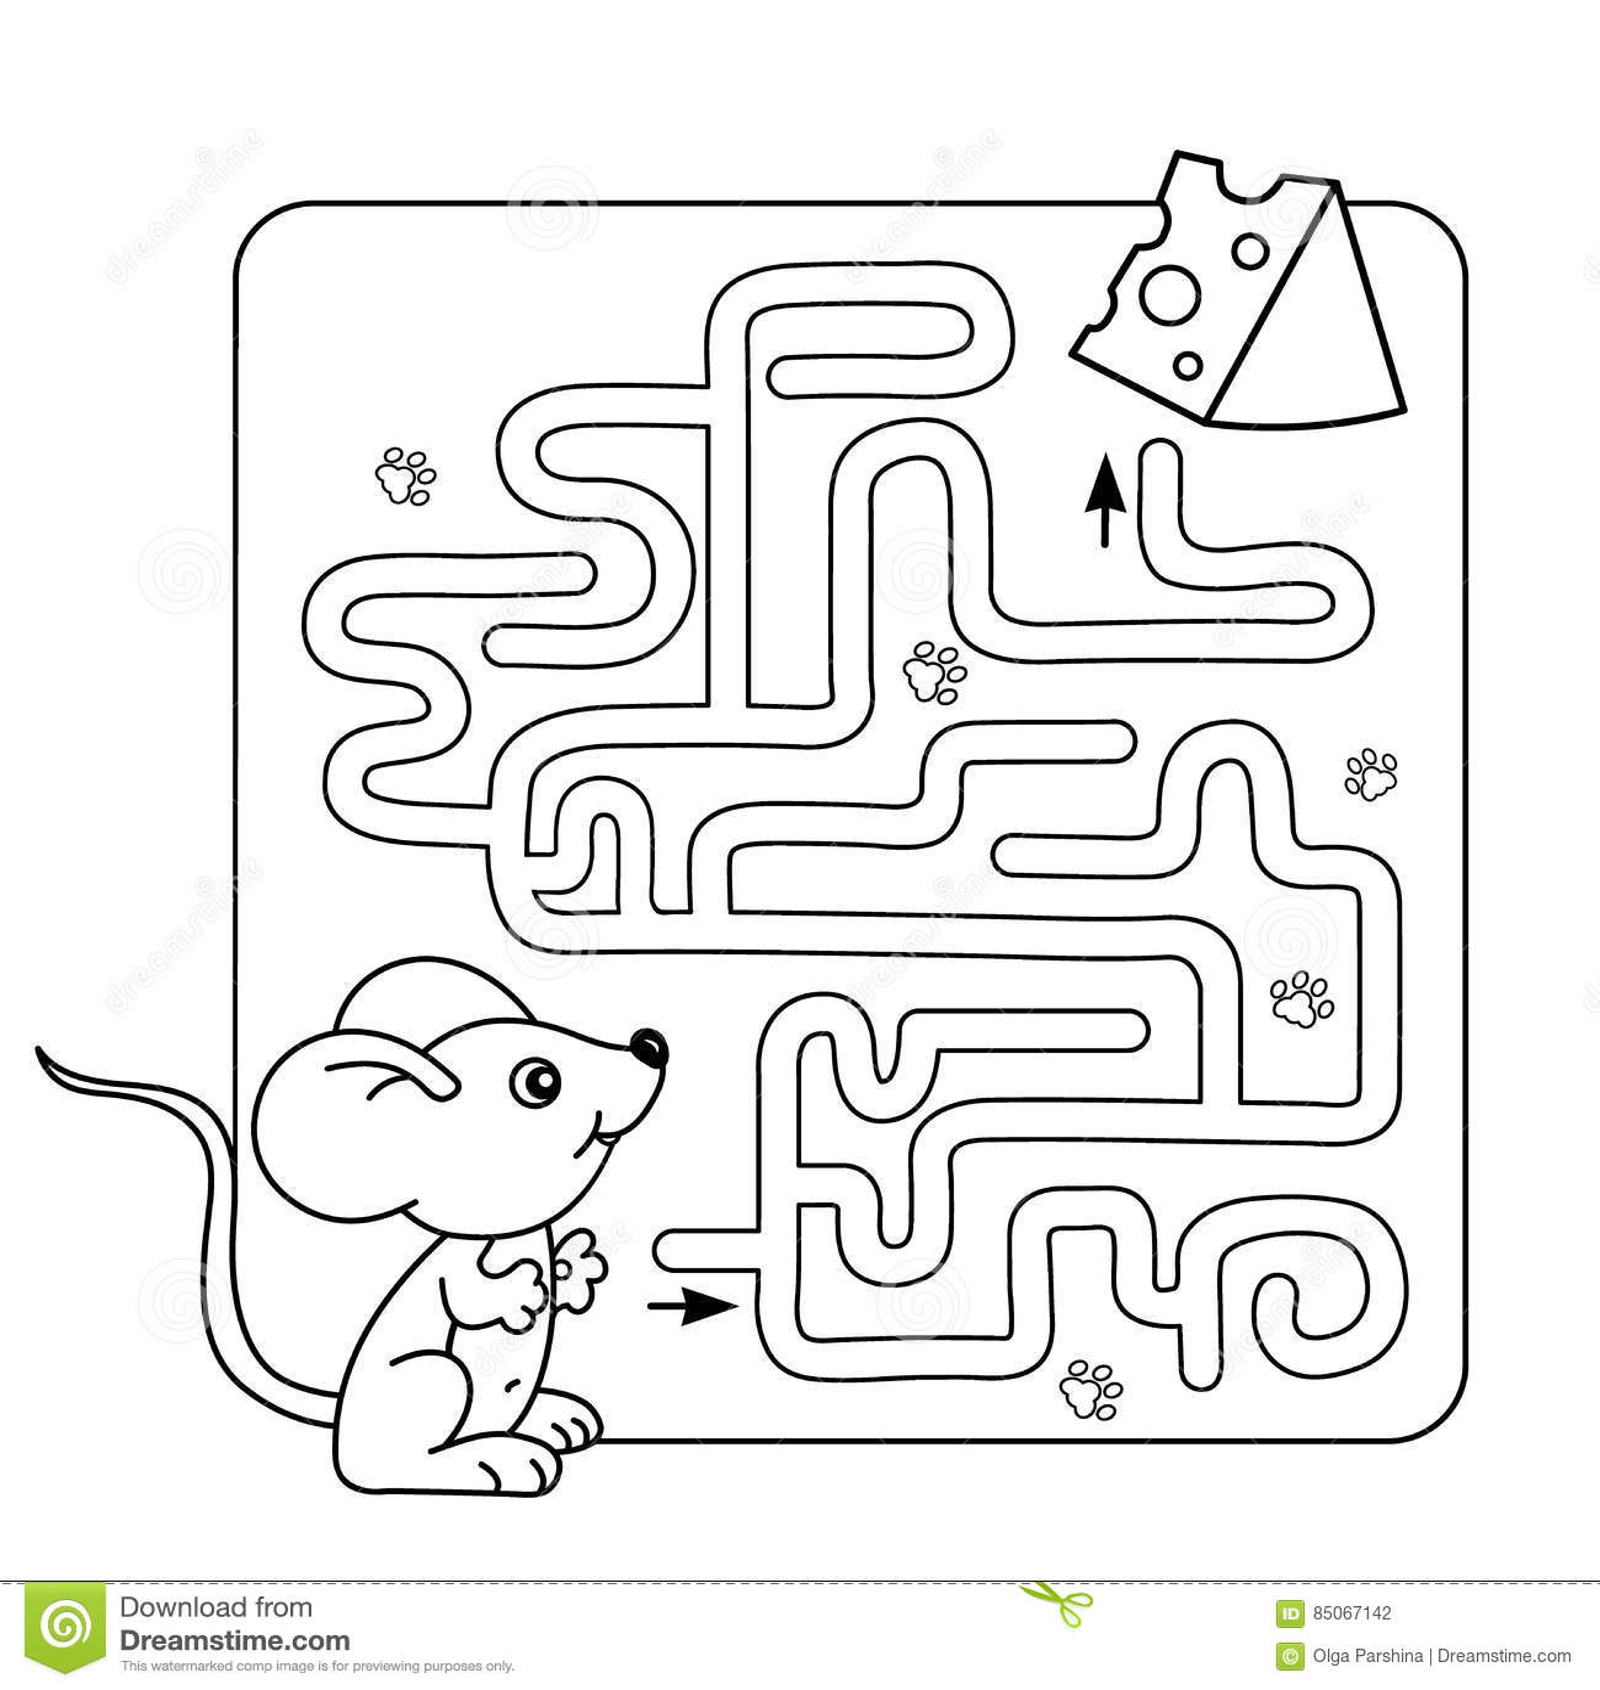 Labyrinth Oder Labyrinth Spiel Fur Vorschulkinder